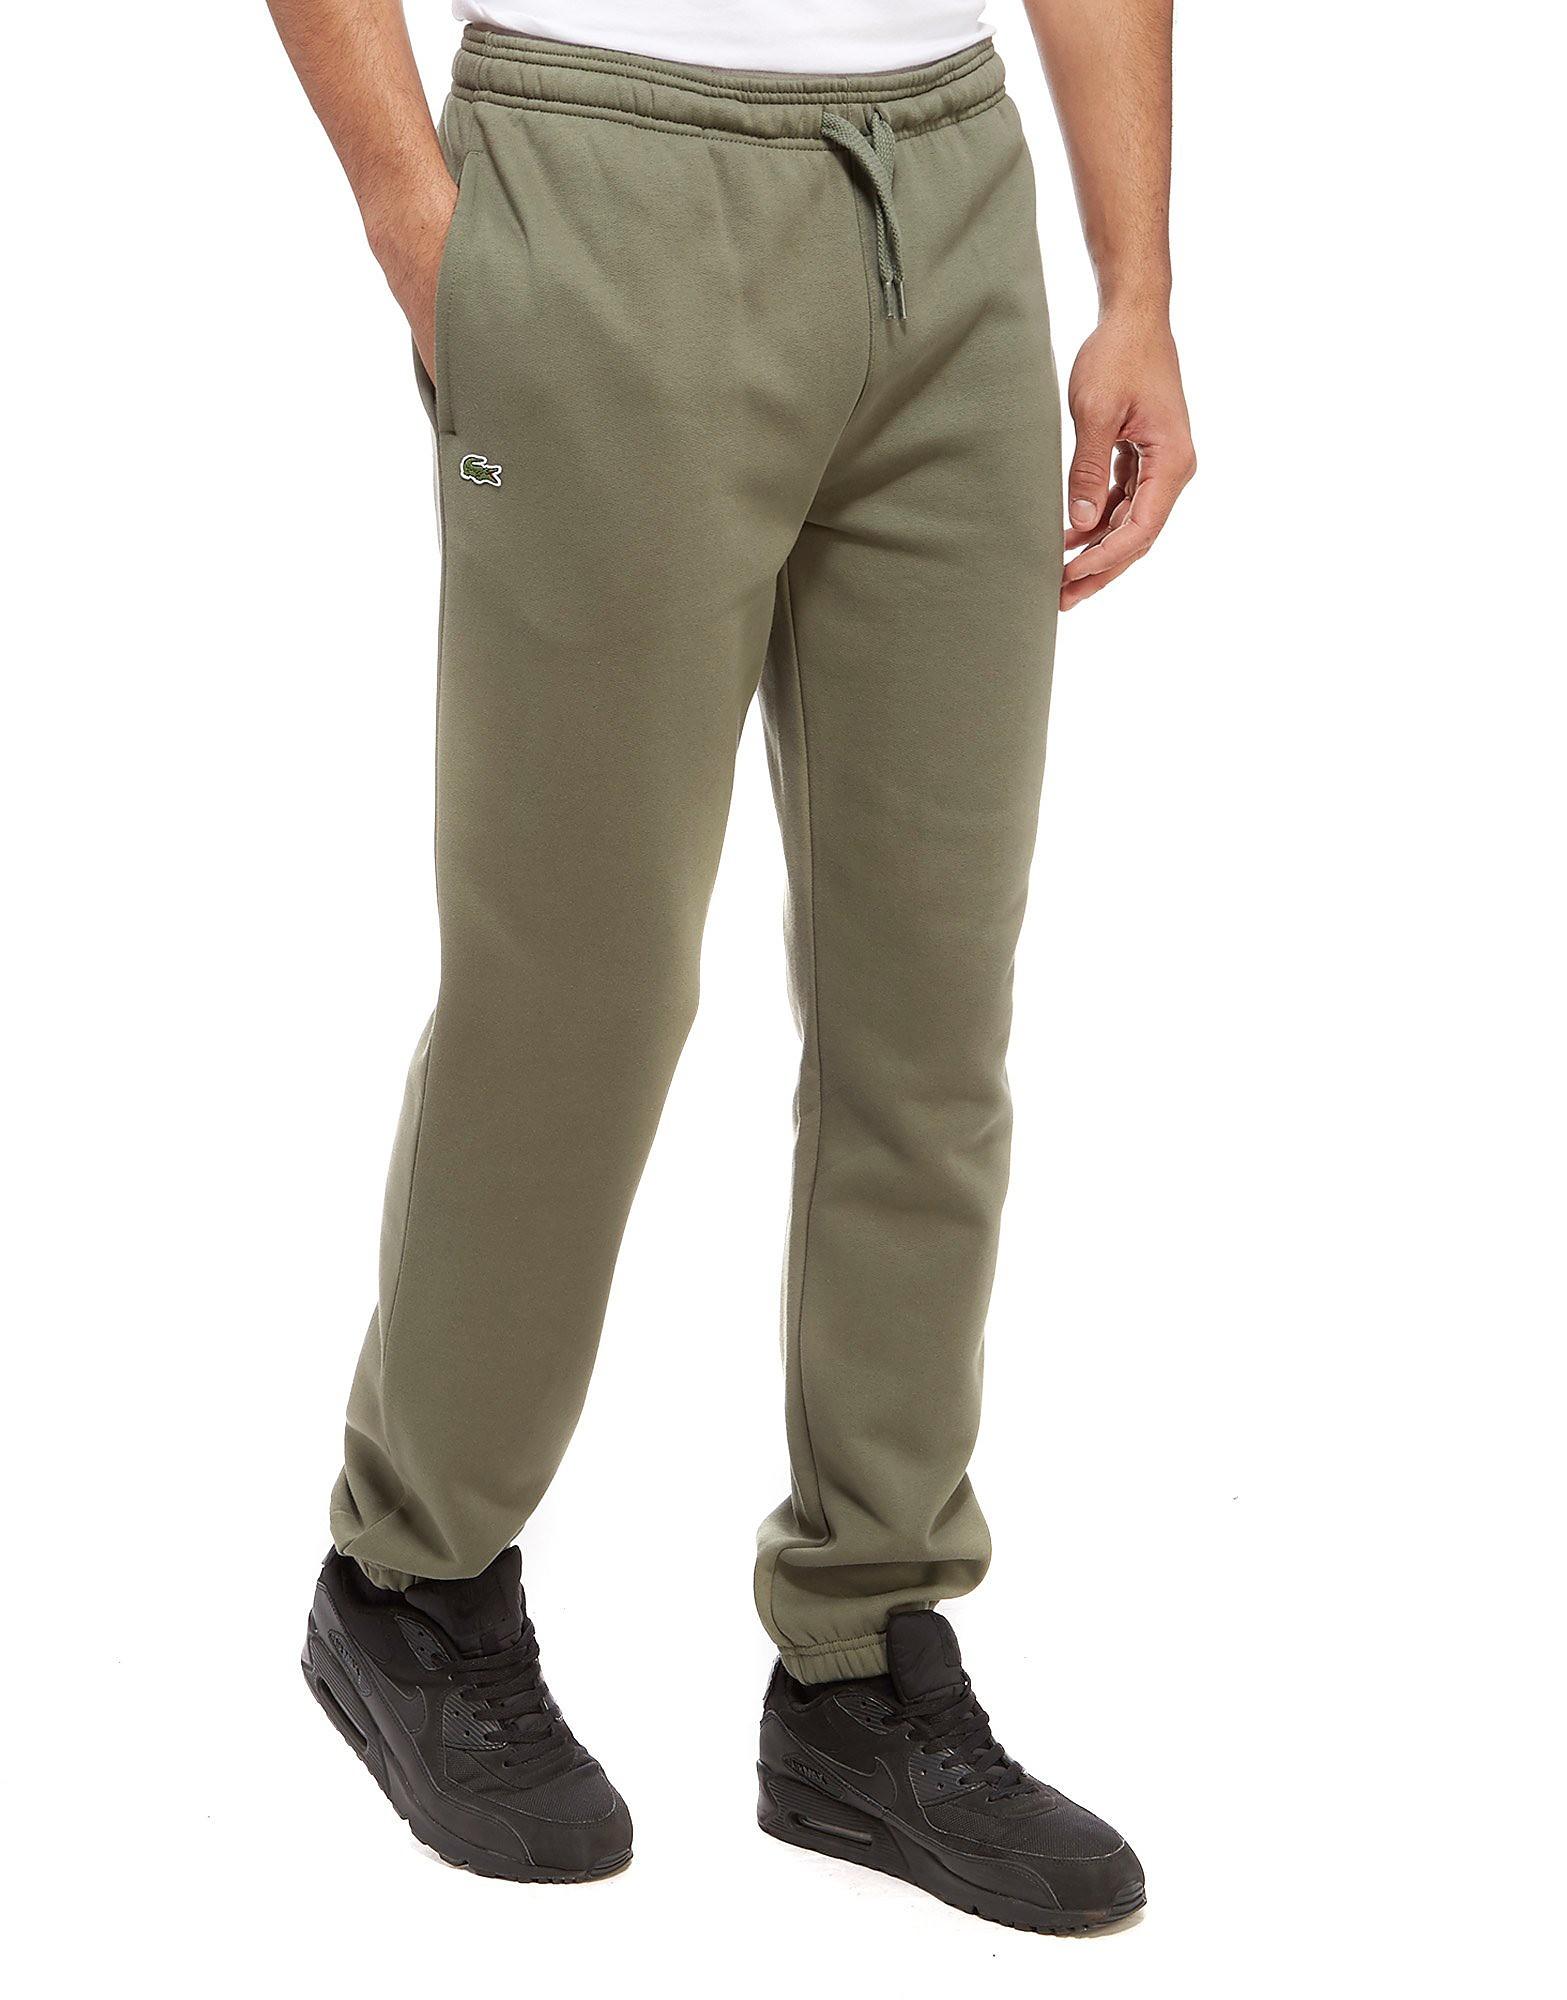 Lacoste Fleece Pants